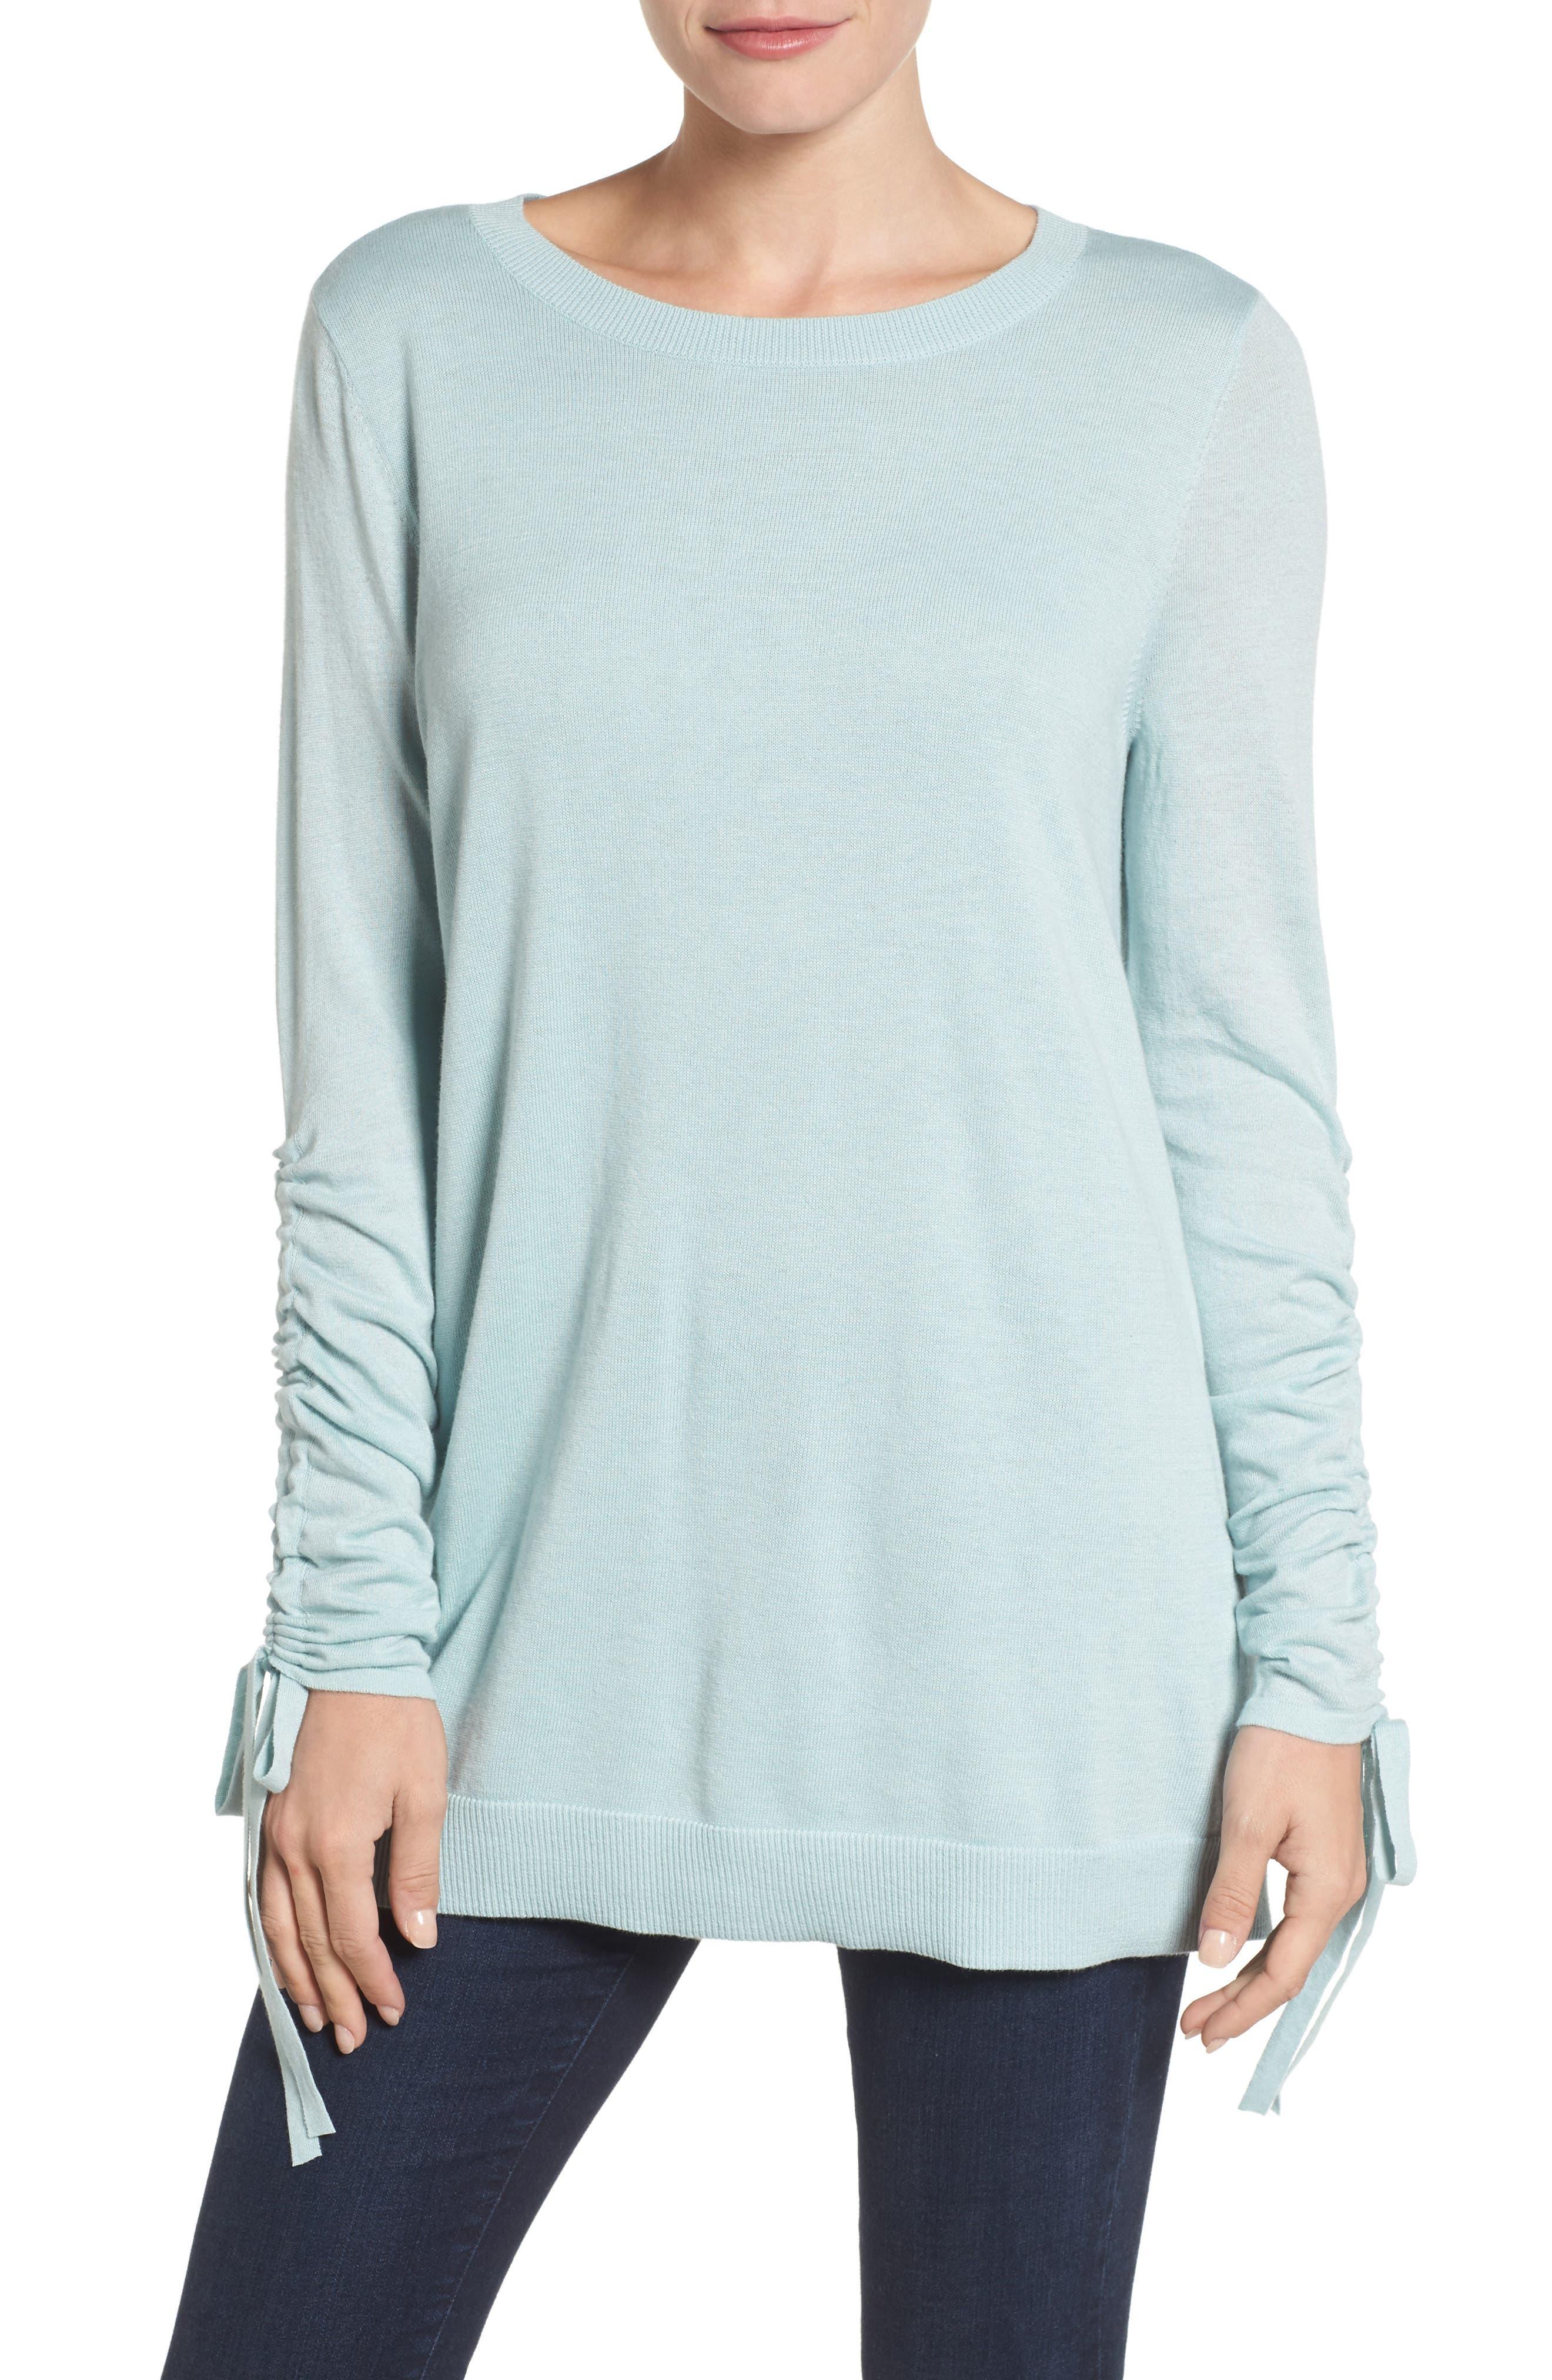 Alternate Image 1 Selected - Halogen® Ruched Sleeve Tunic Sweater (Regular & Petite)